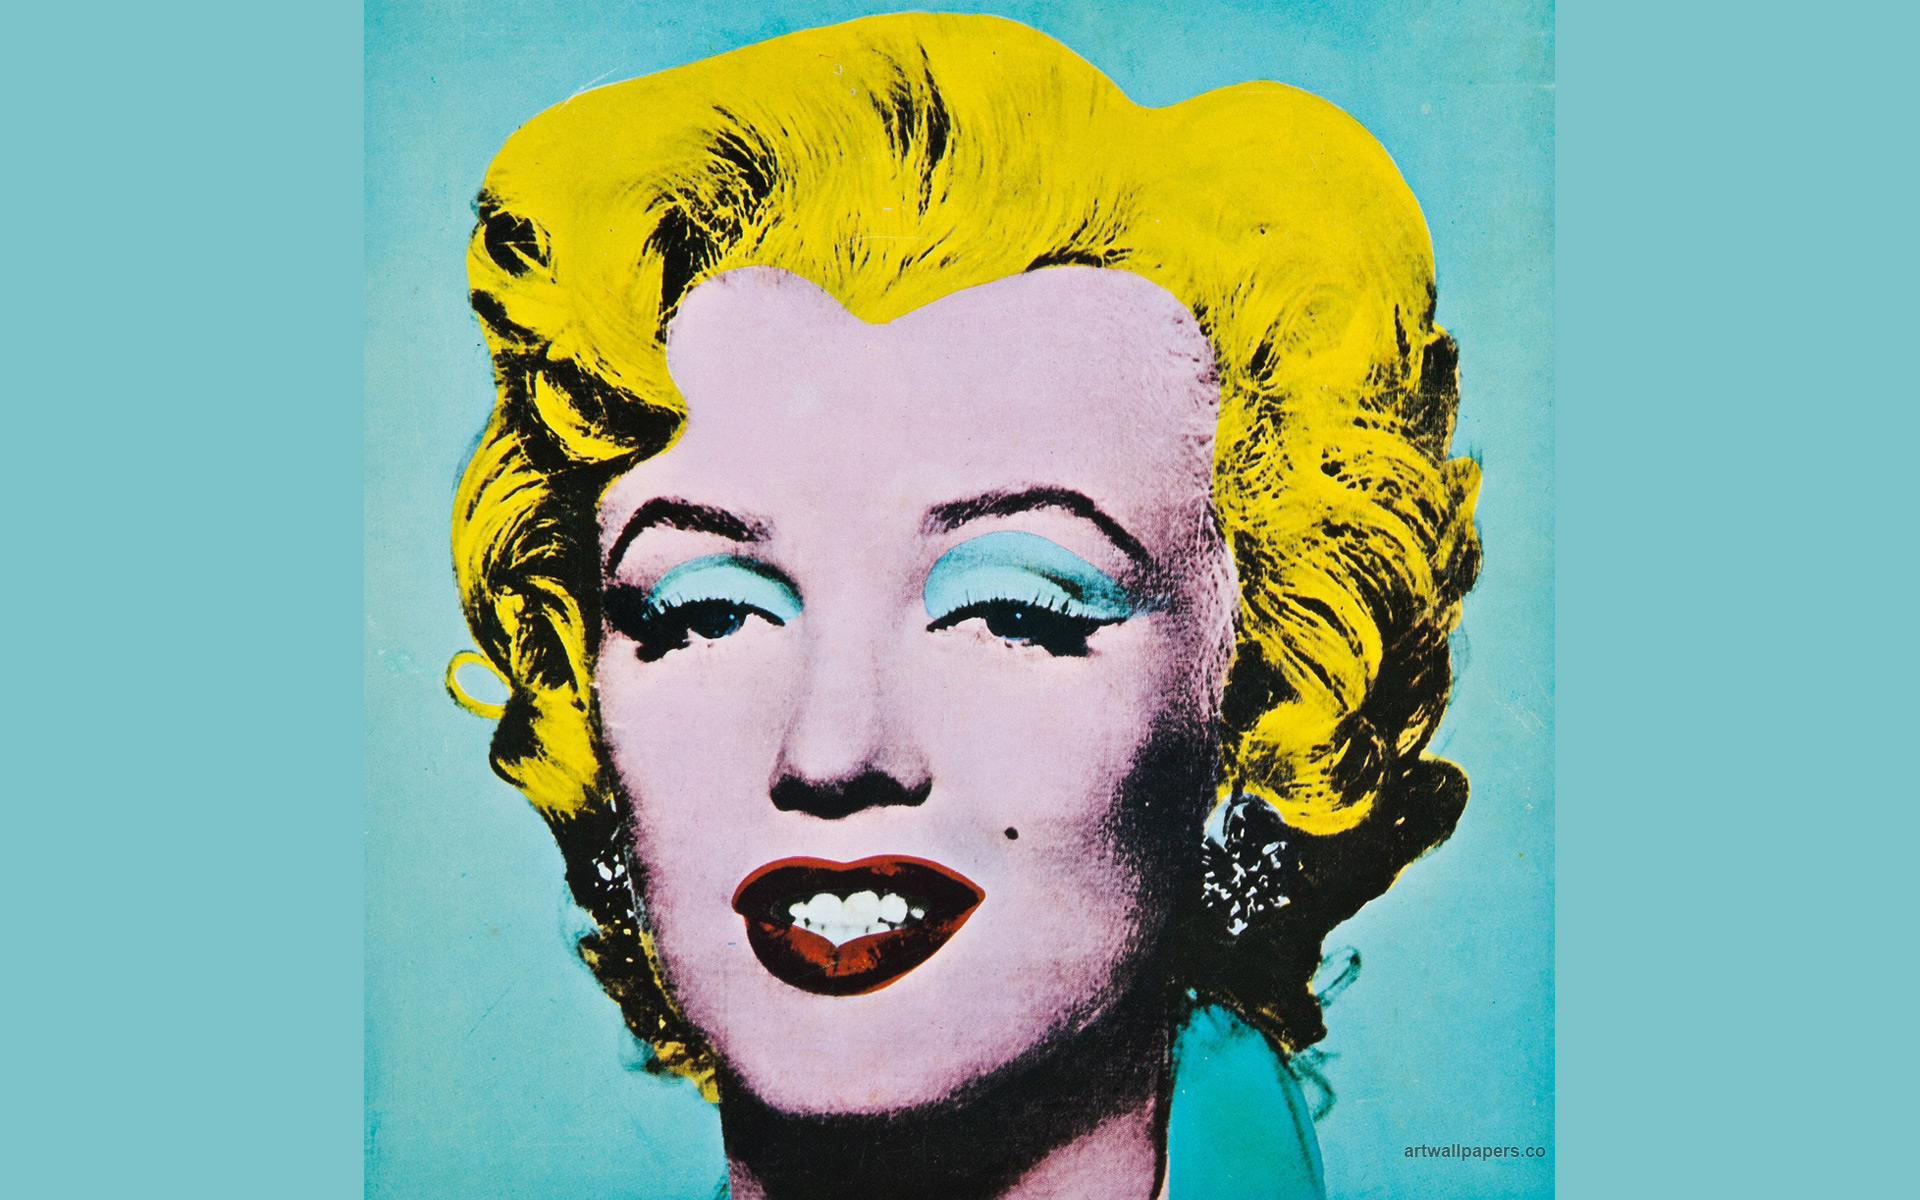 Andy Warhol Wallpapers Desktop Art Backgrounds 1920x1200